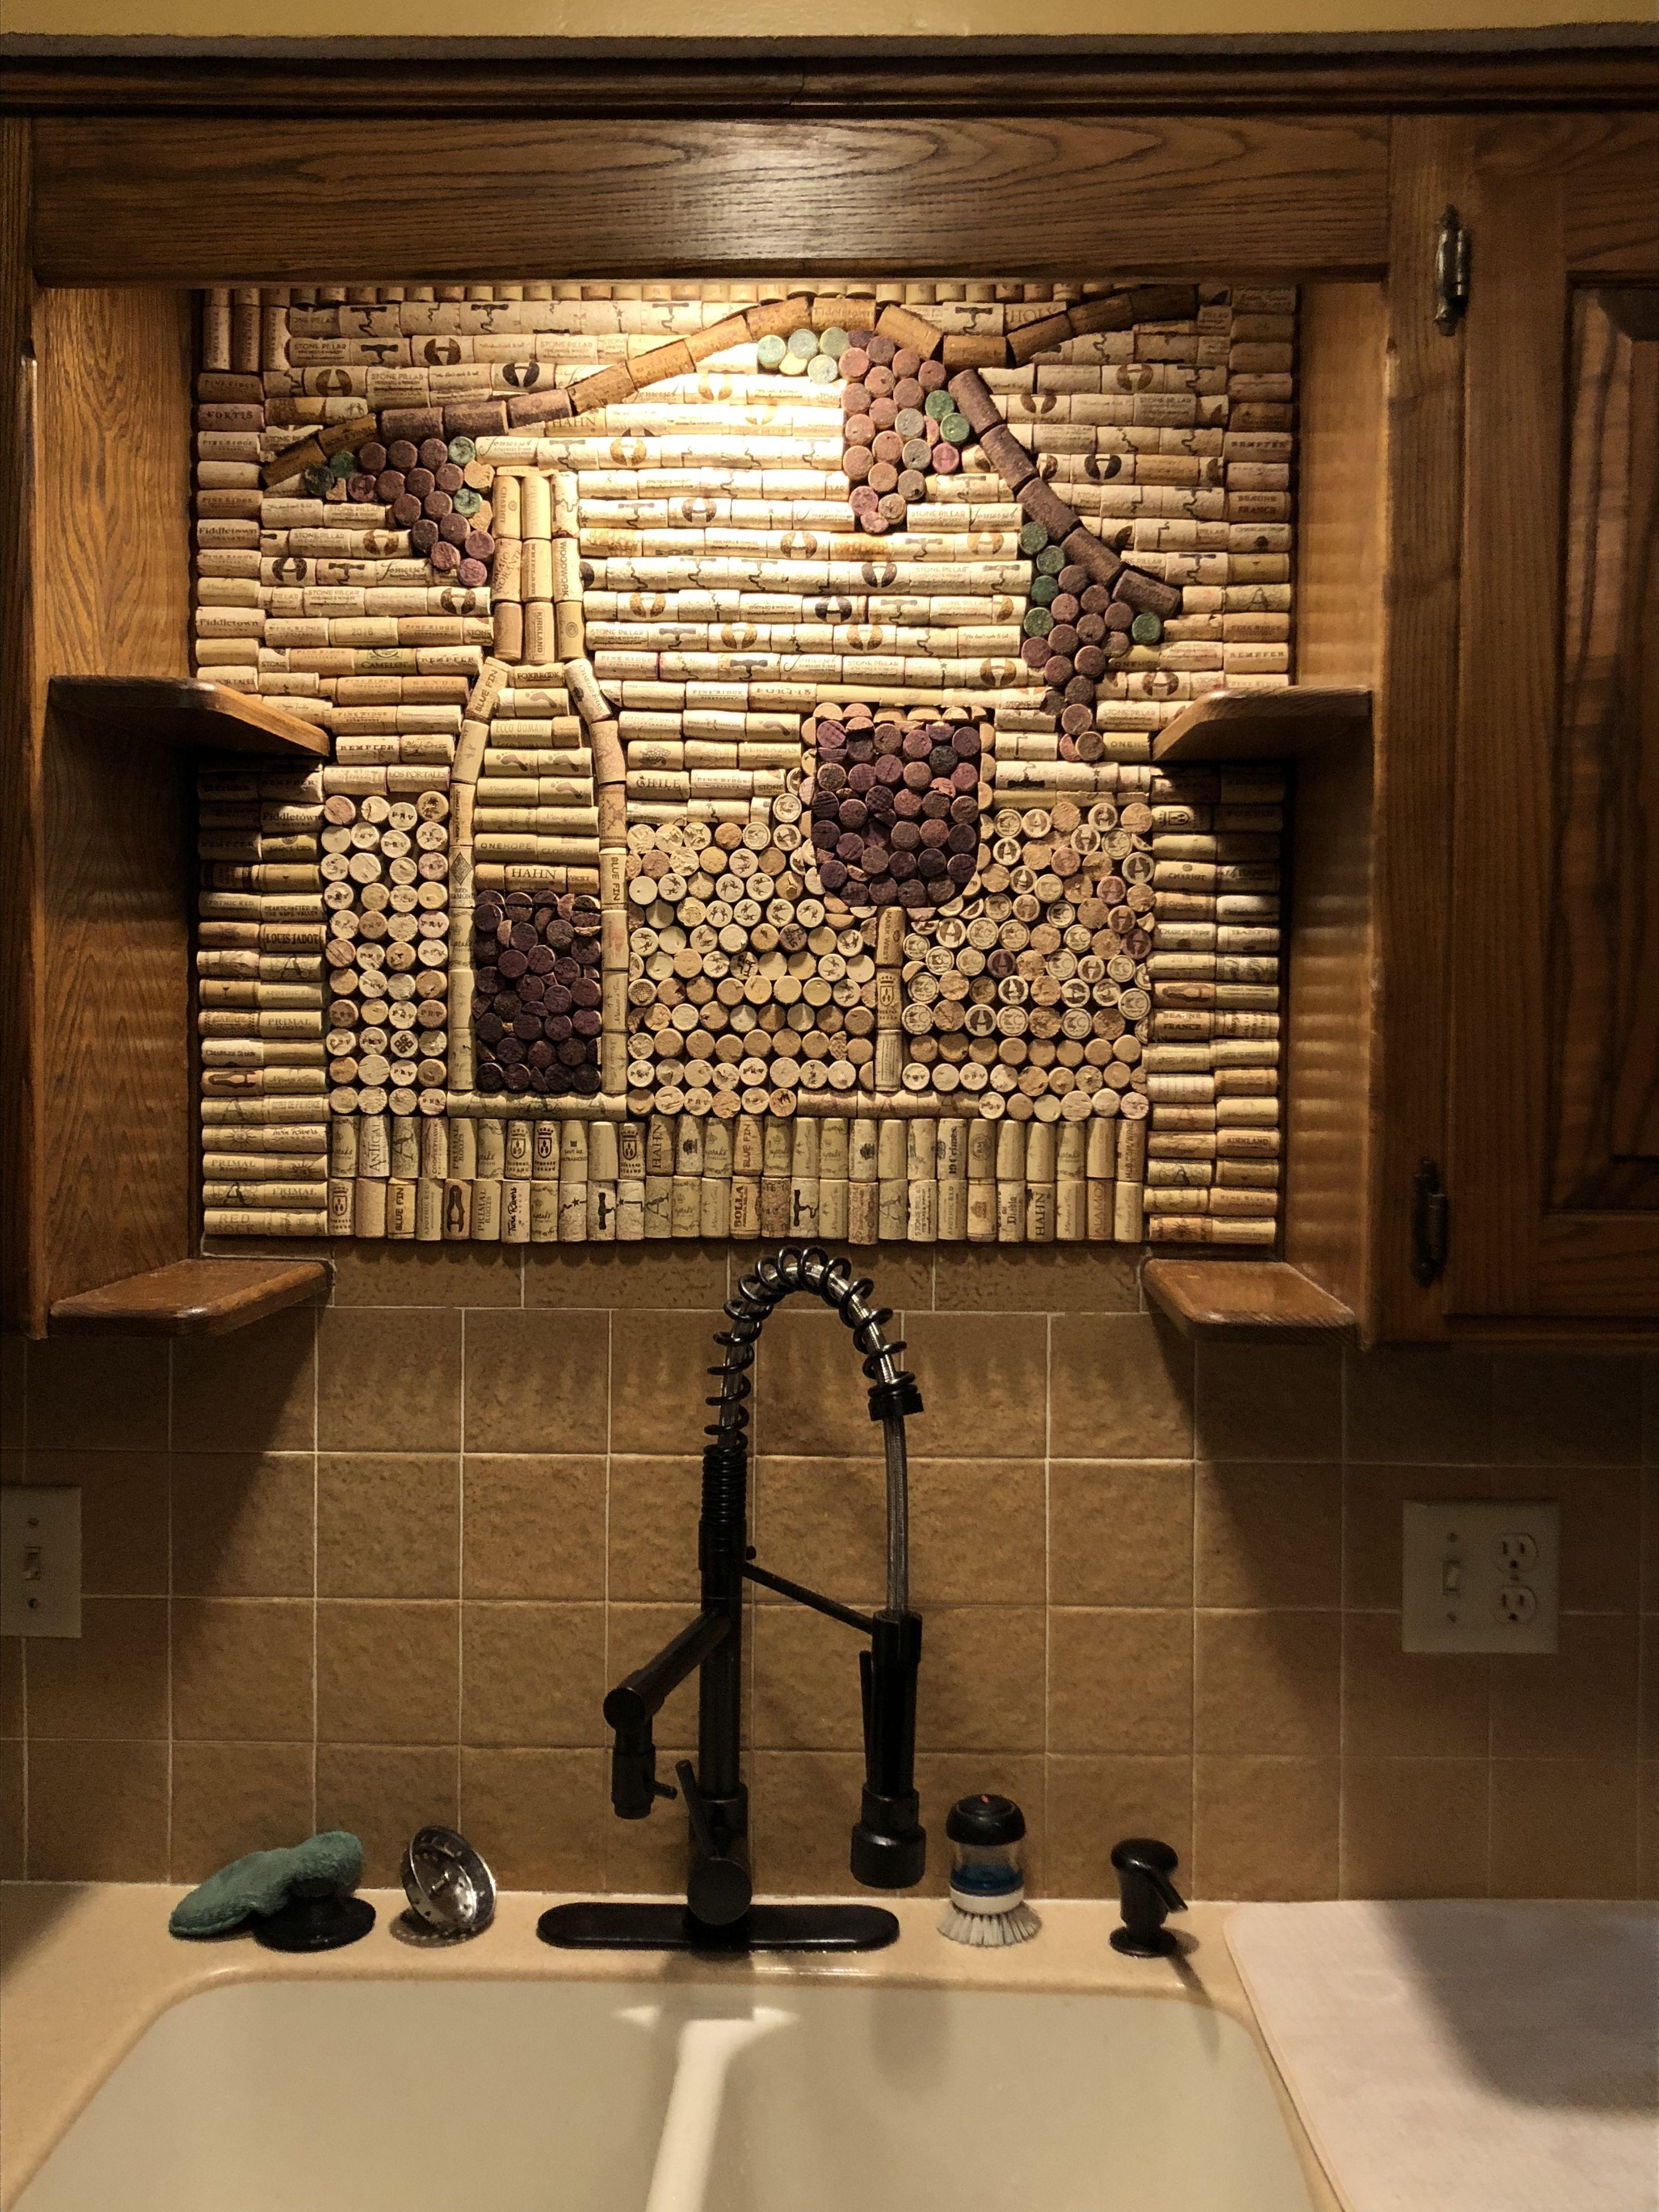 Pin by Kathy on wine cork wall backsplash Cork